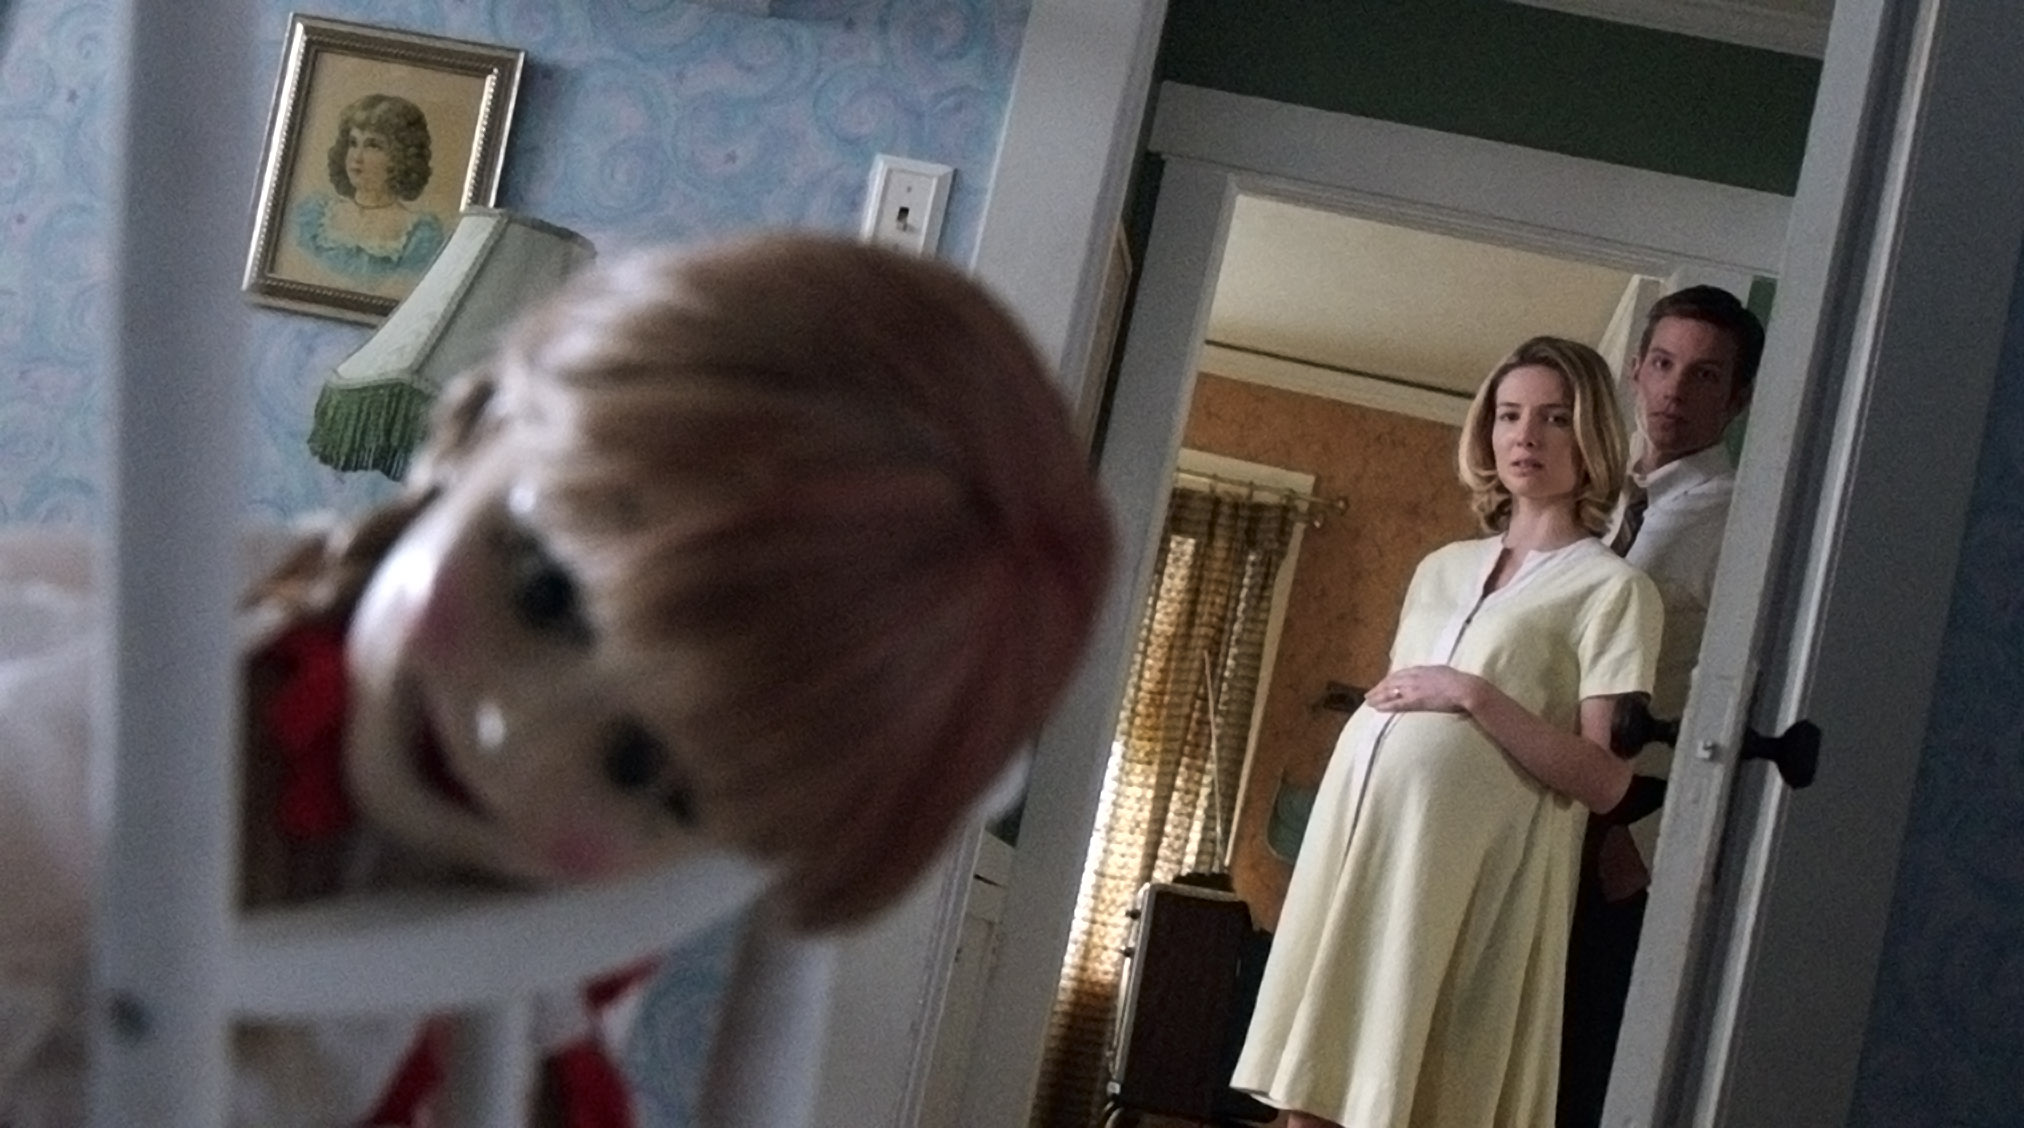 http://collider.com/wp-content/uploads/annabelle-movie-7.jpg